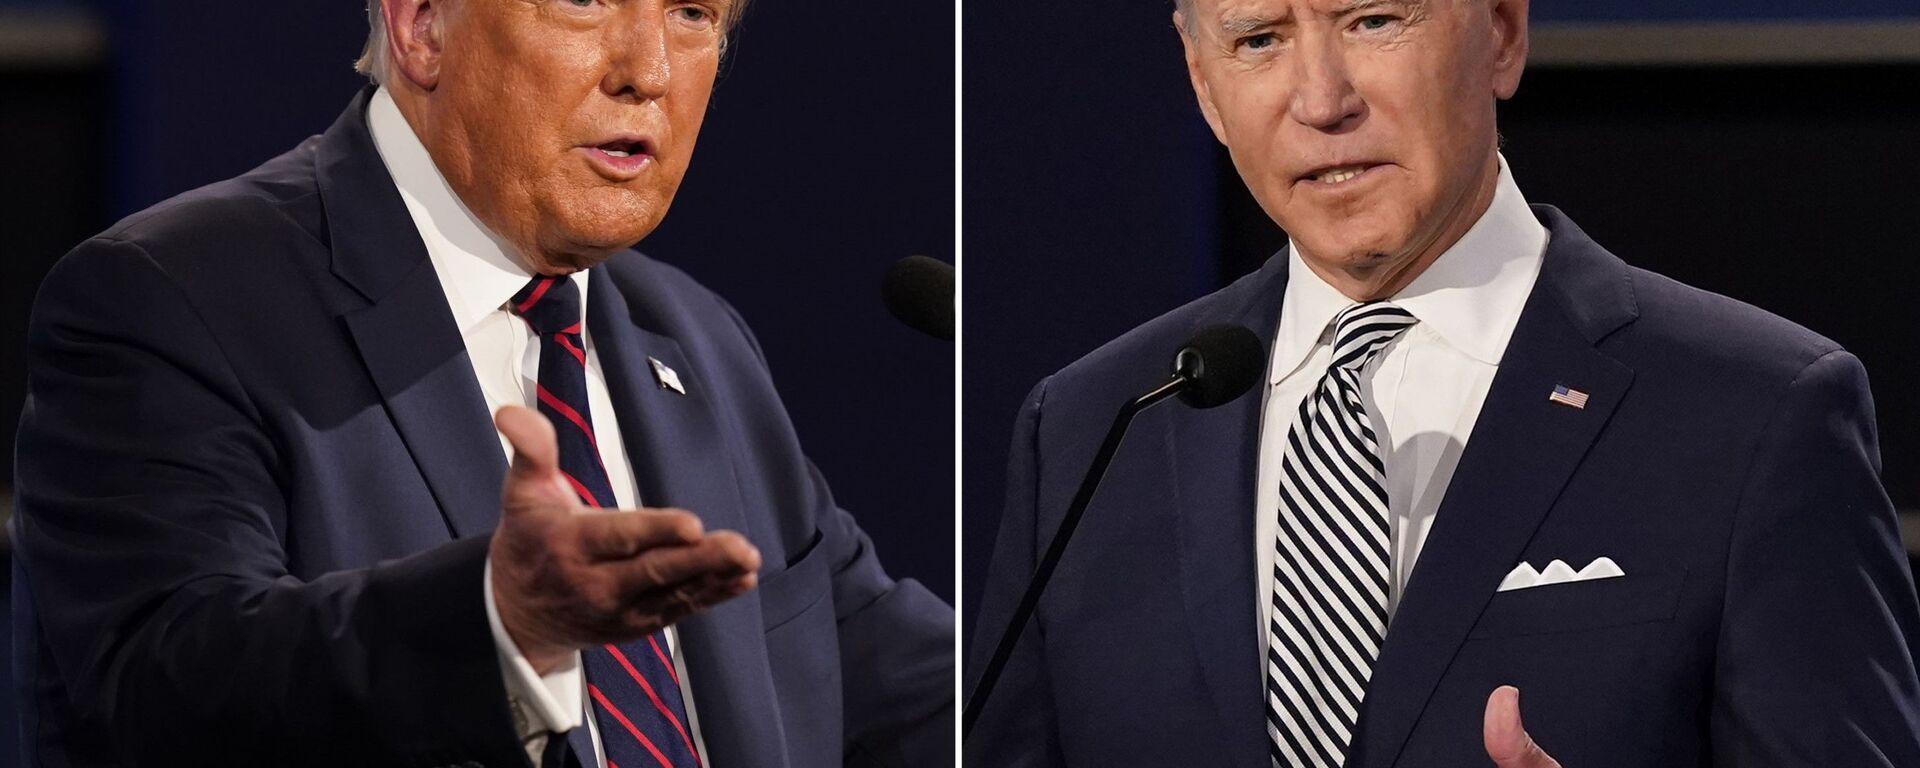 Scontro tra Joe Biden e Donald Trump - Sputnik Italia, 1920, 15.03.2021